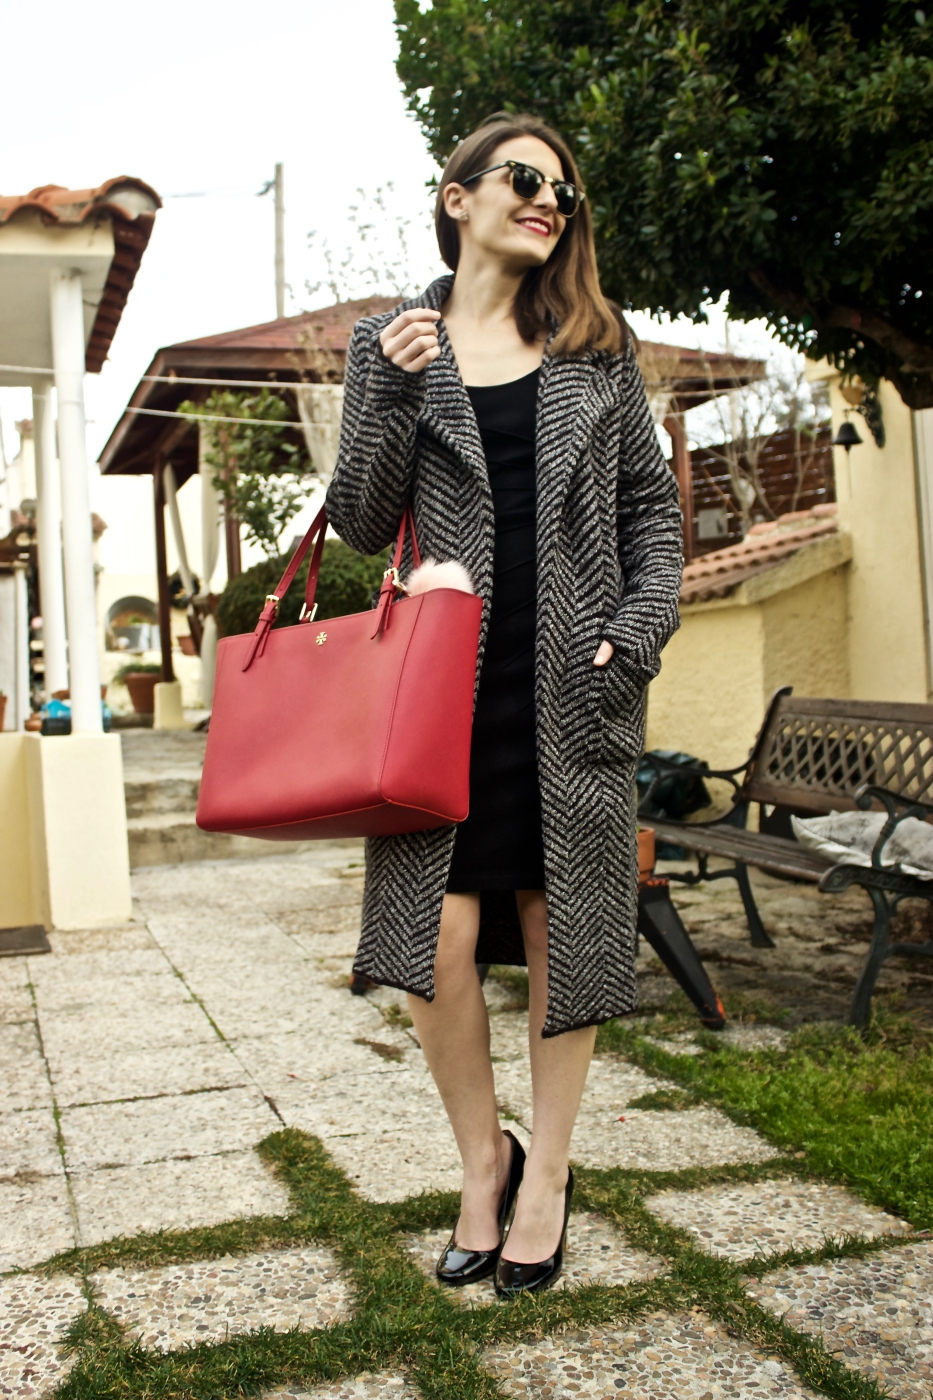 lara-vazquez-madlula-fashion-look-ootd-tory-burch